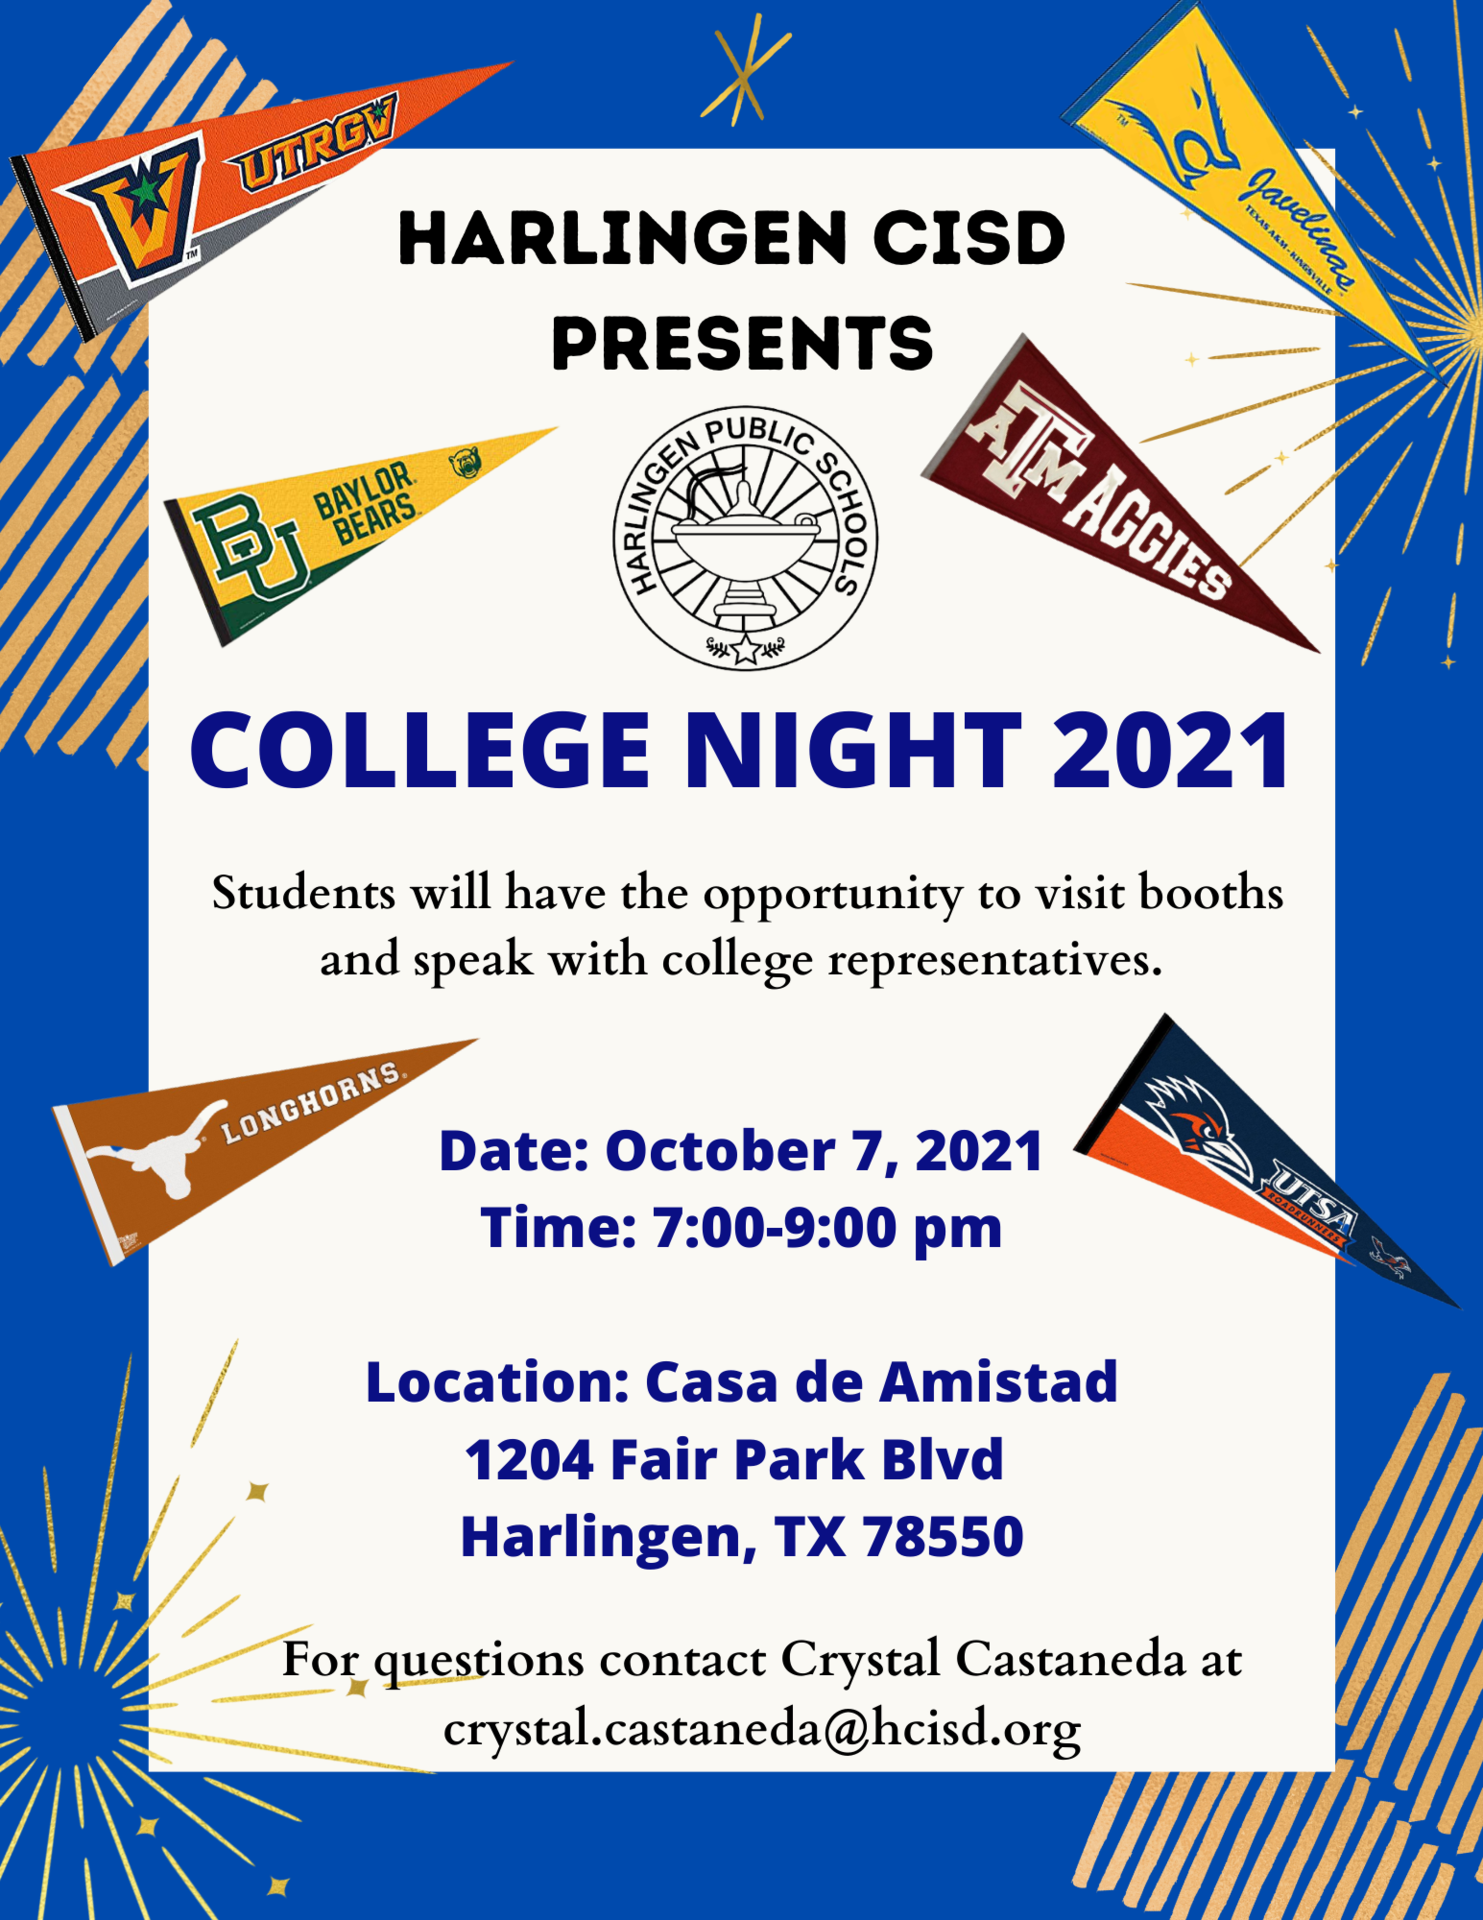 HCISD College Night 2021